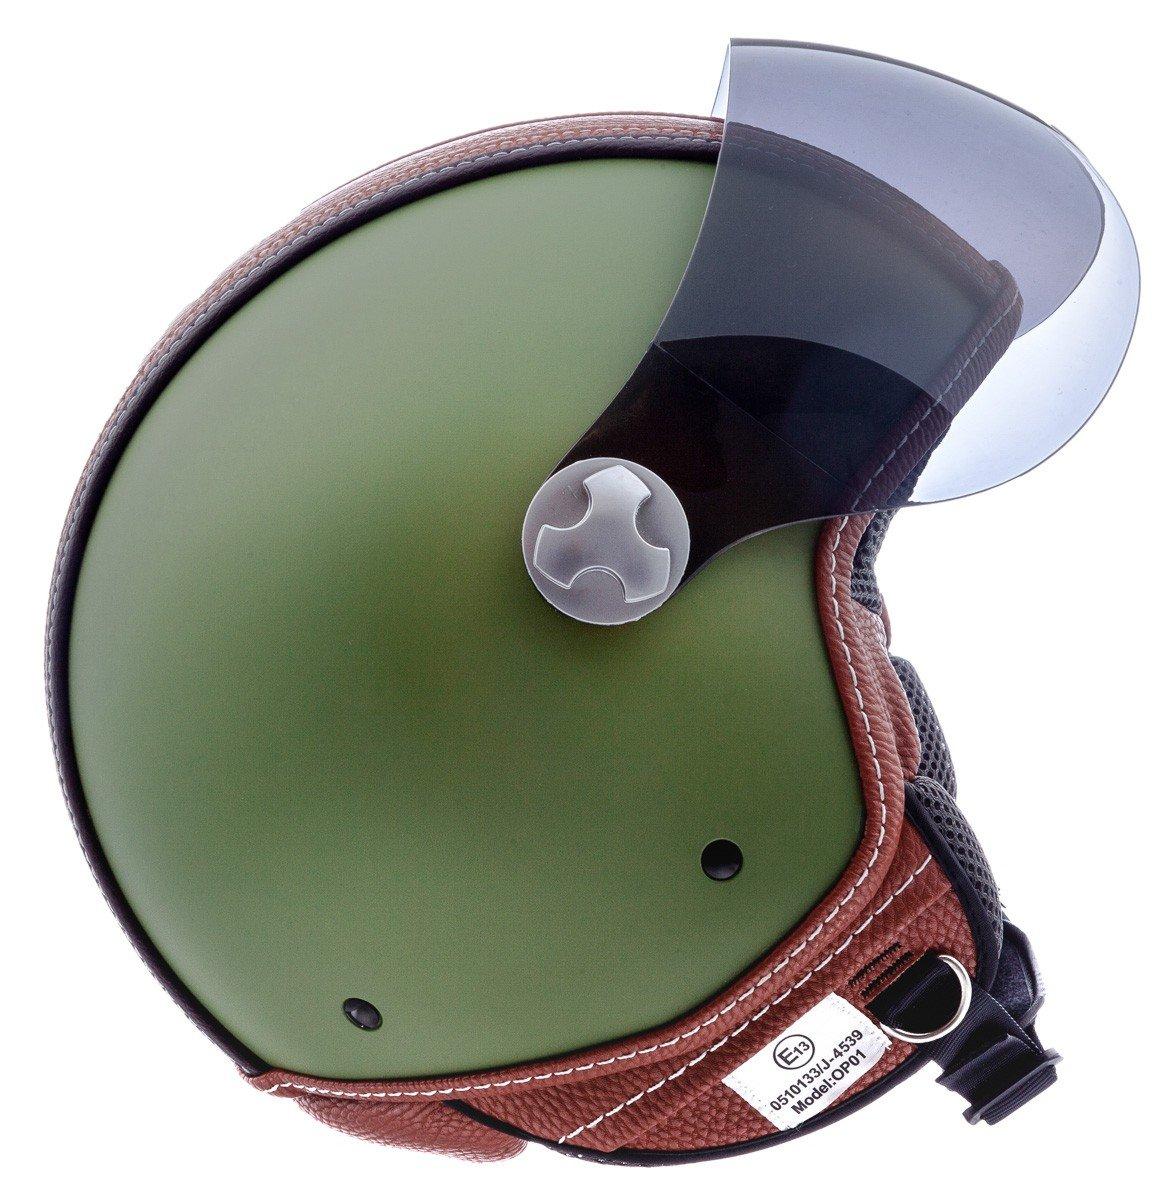 "ARMOR · AV-84 ""Vintage Deluxe Green"" (Grün) · Jet-Helm · Roller Motorrad-Helm Scooter-Helm Mofa Chopper Bobber · ECE certified · Visier · Click-n-Secure Clip · Tragetasche · XL (61-62"